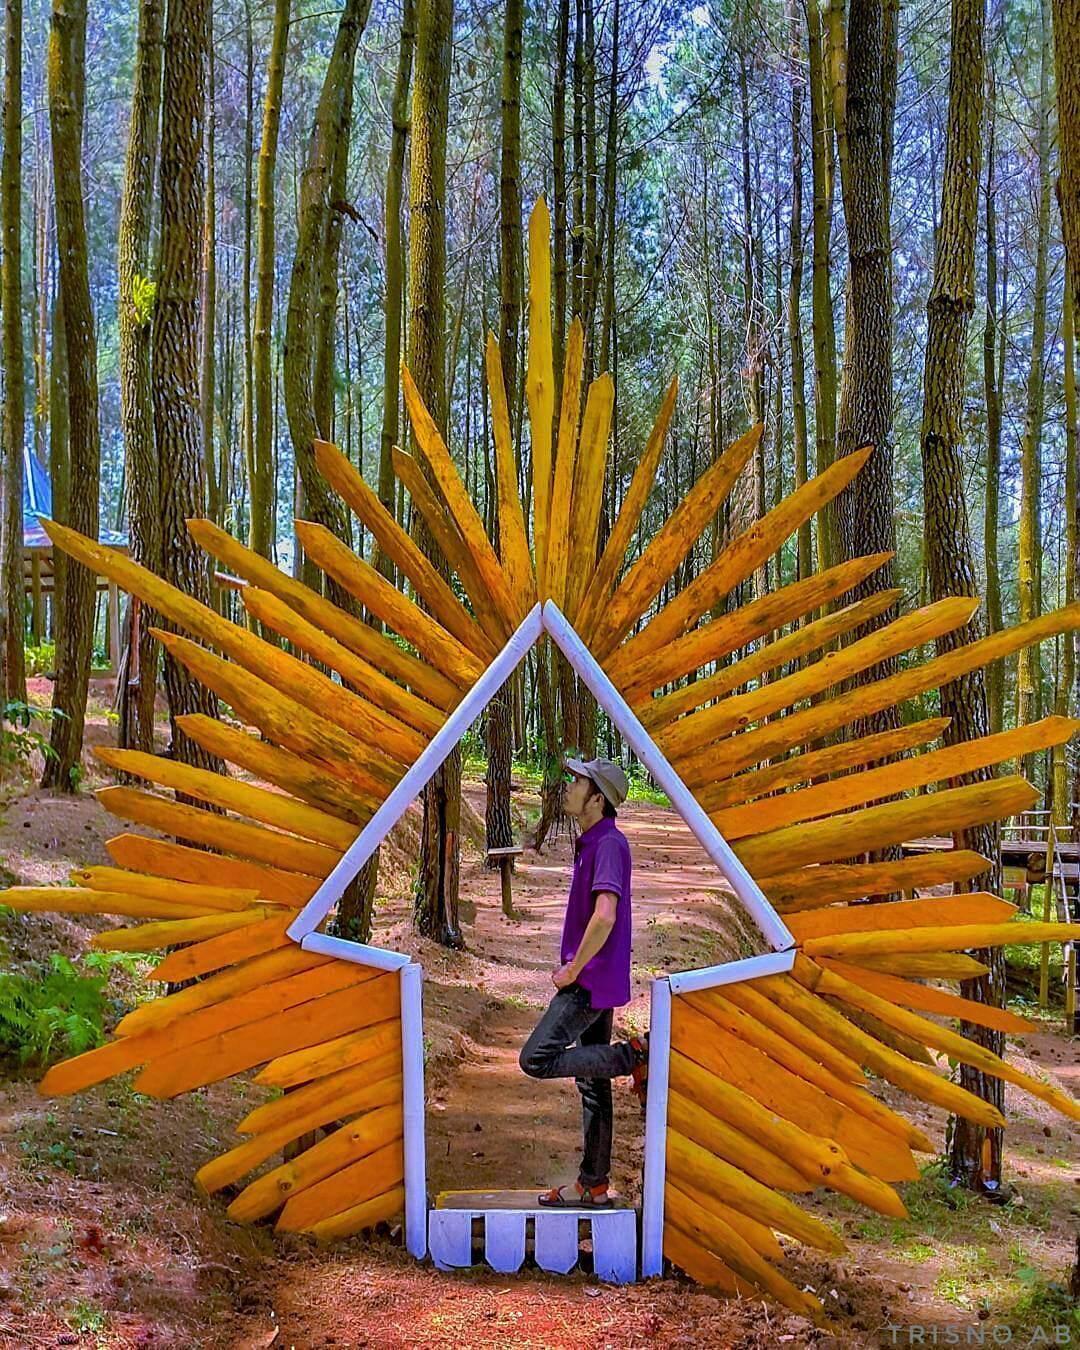 Bukit Asri Kertojoyo Wisata Selfie Kekinian Adem Magelang Hutan Pinus